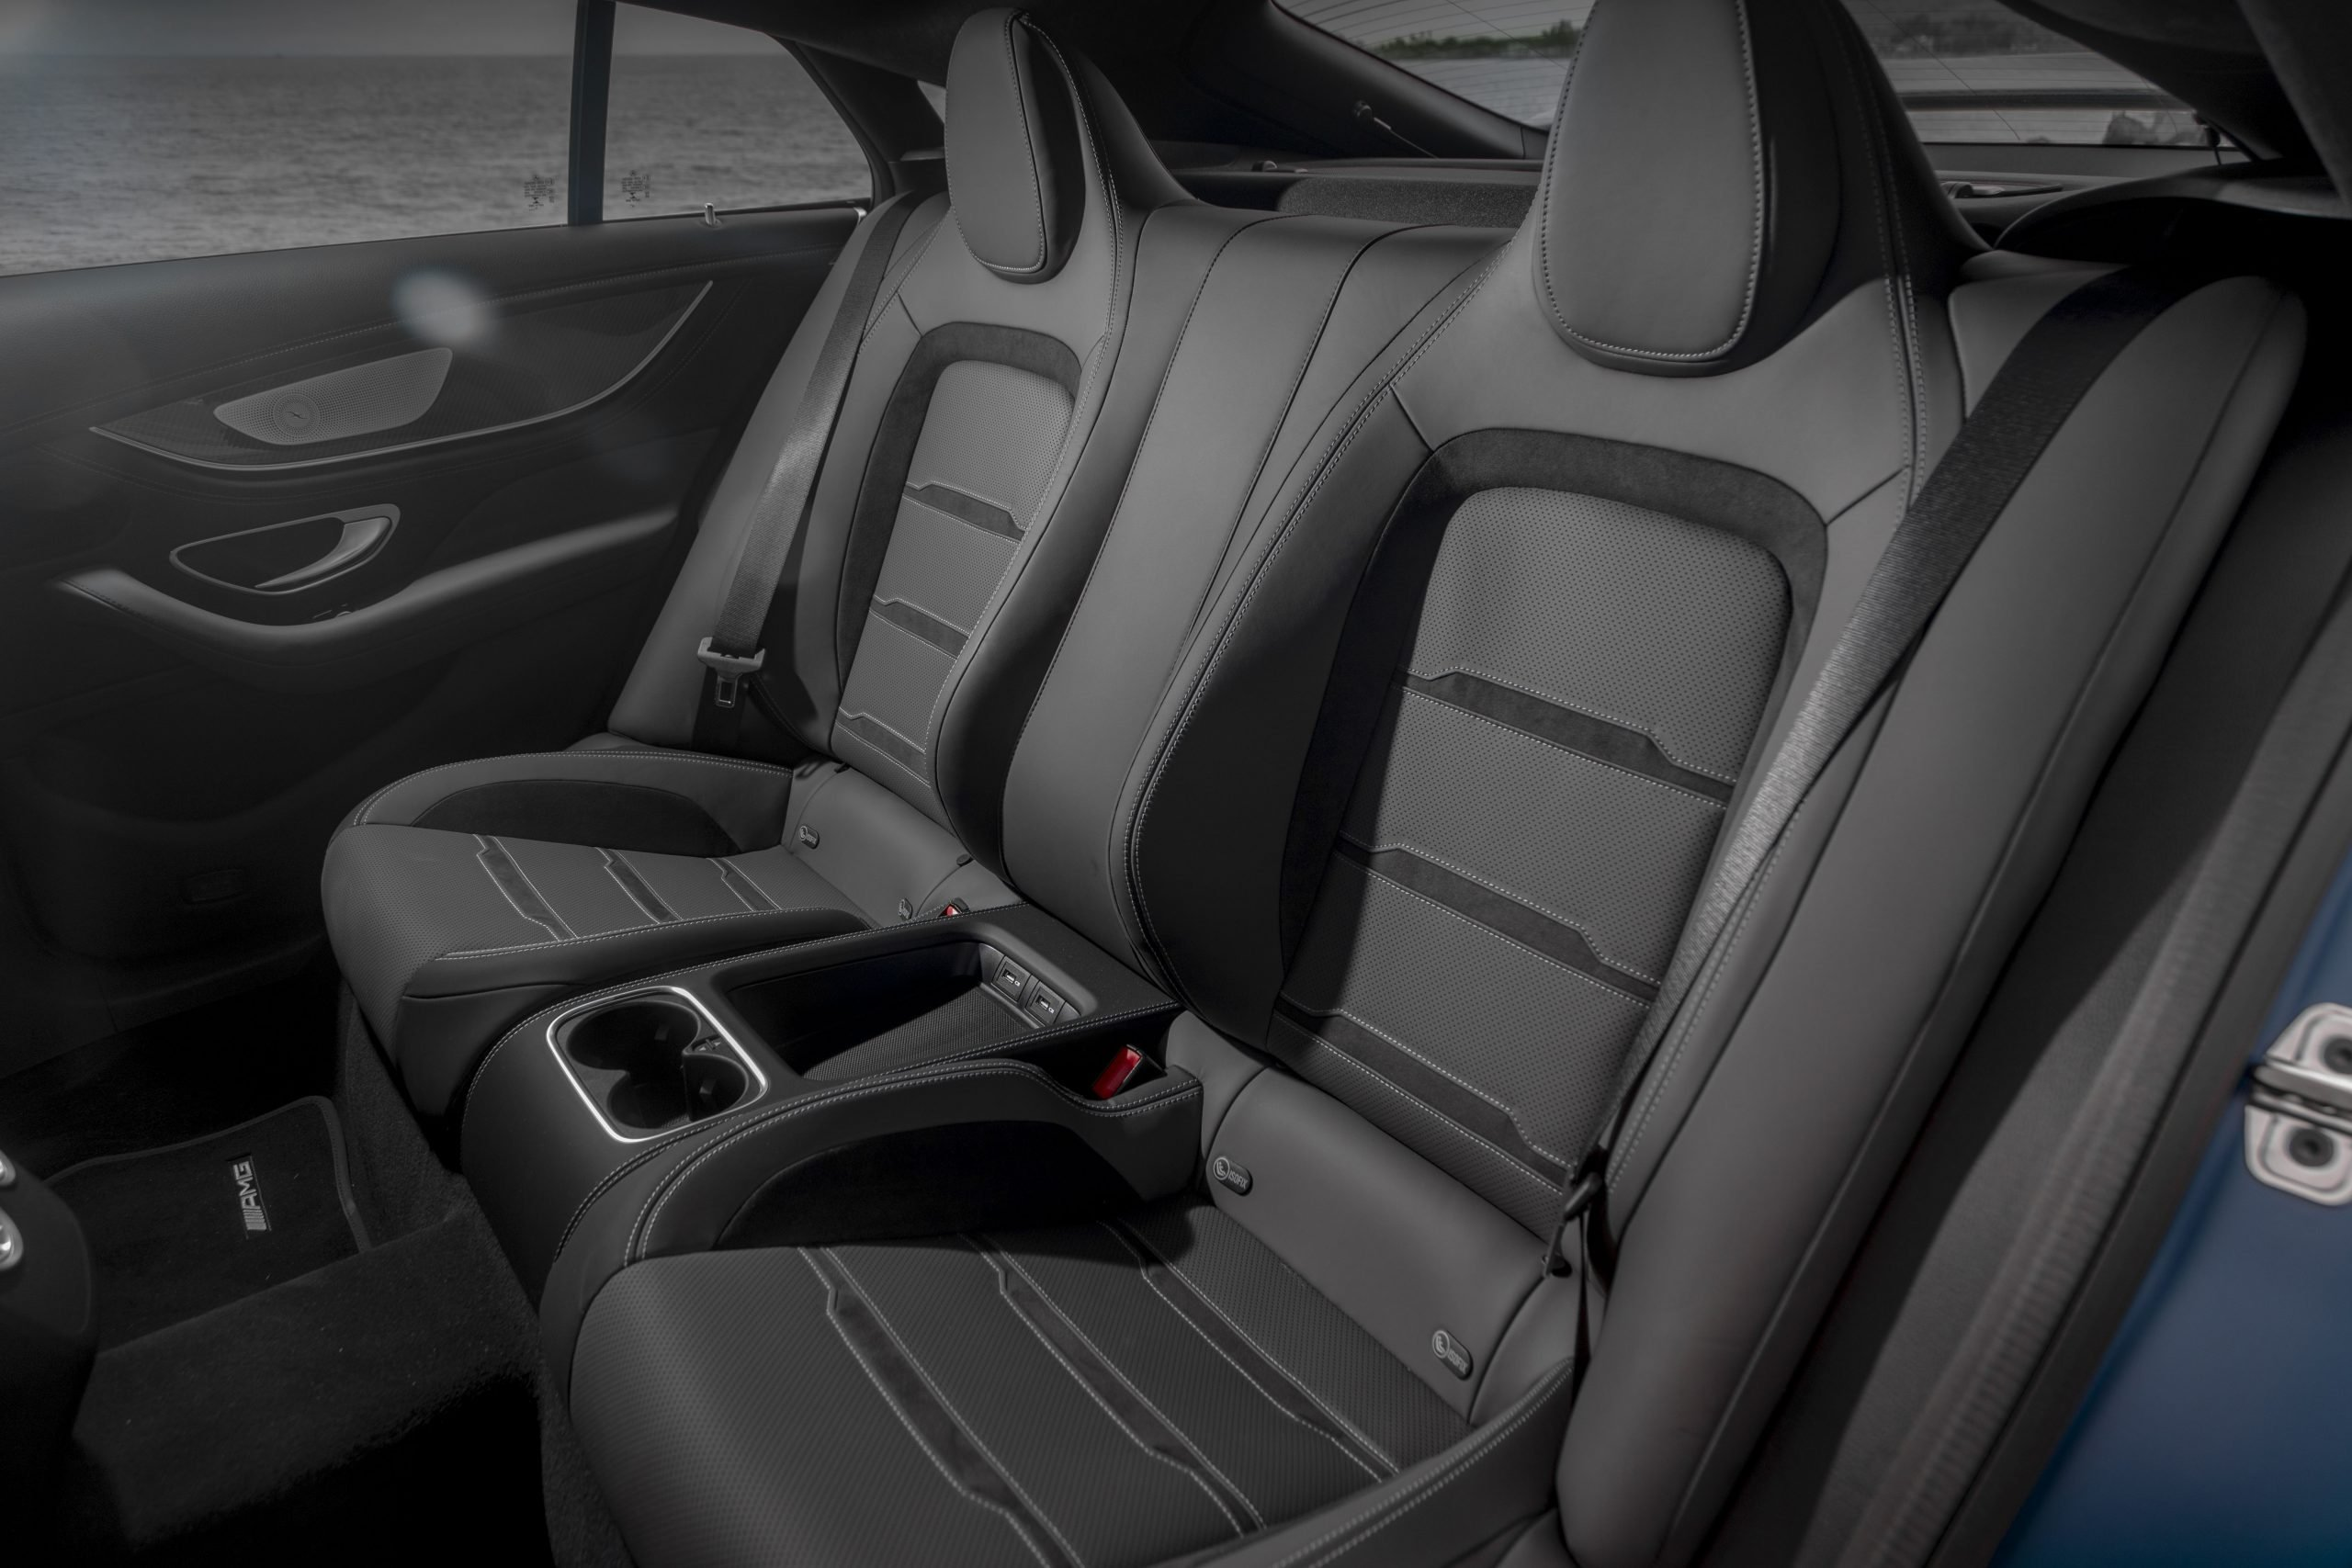 2021 Mercedes-AMG GT 63 S Rear Seats